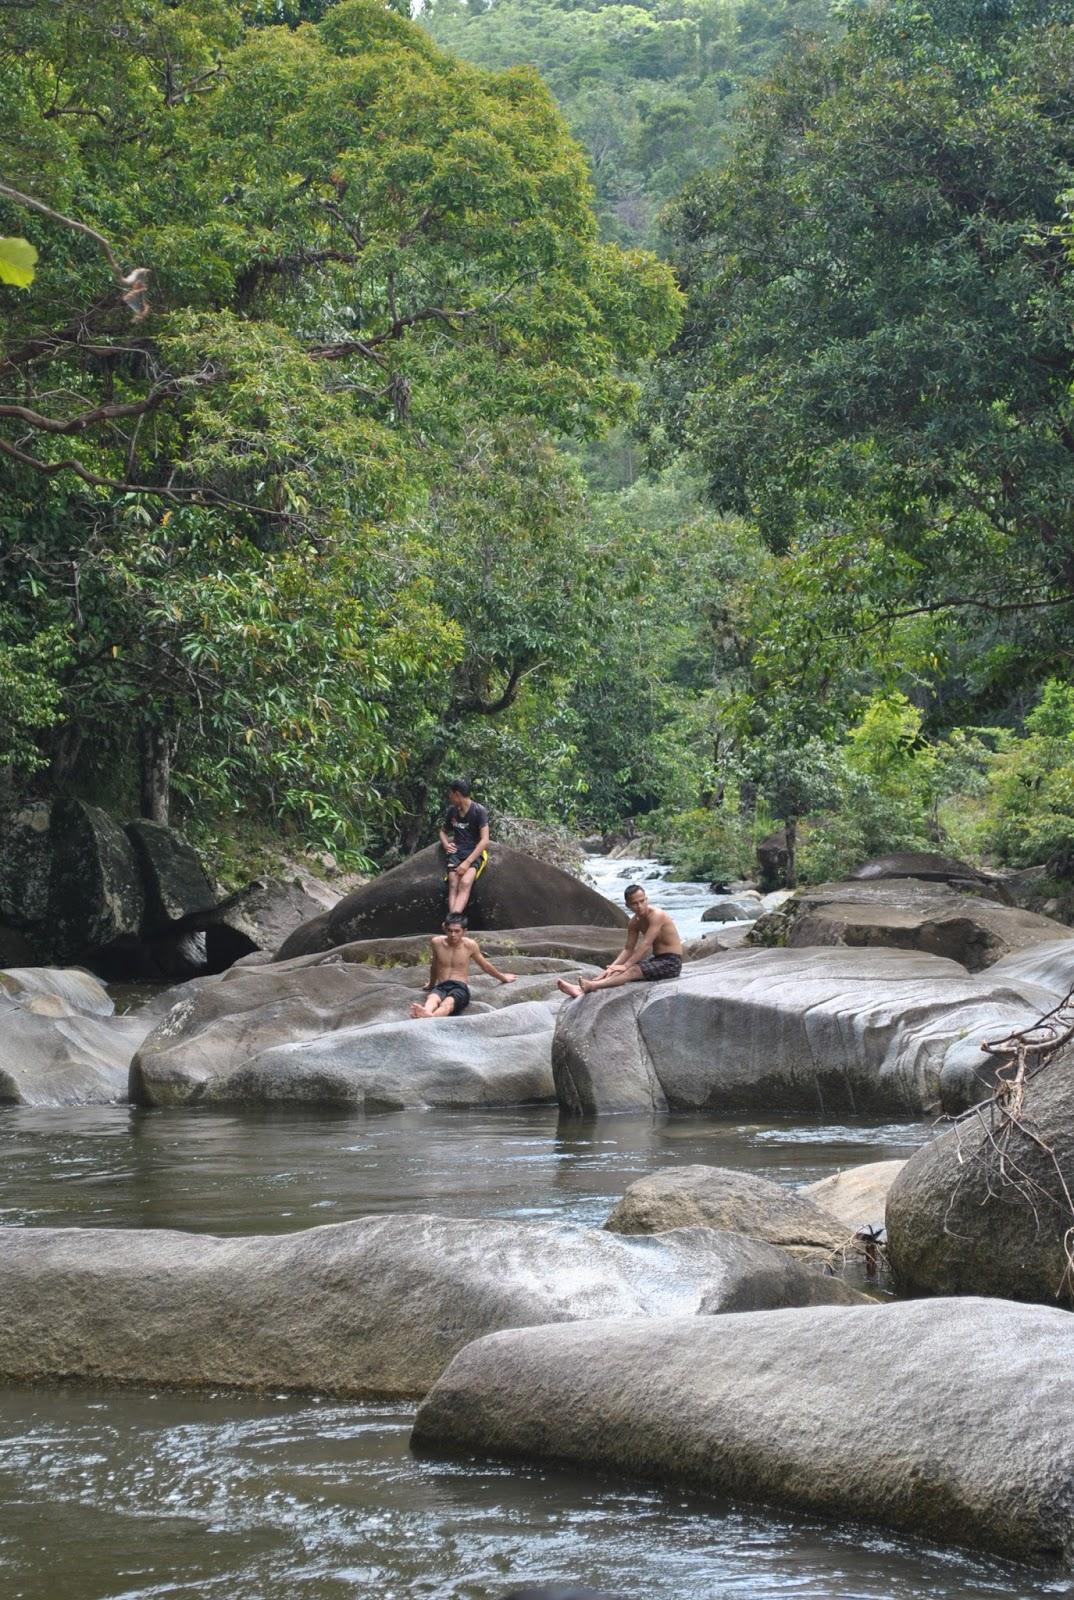 Wisata Alam Batu Jato Destinasi Wisata Pilihan Di Sekadau Bujangadau